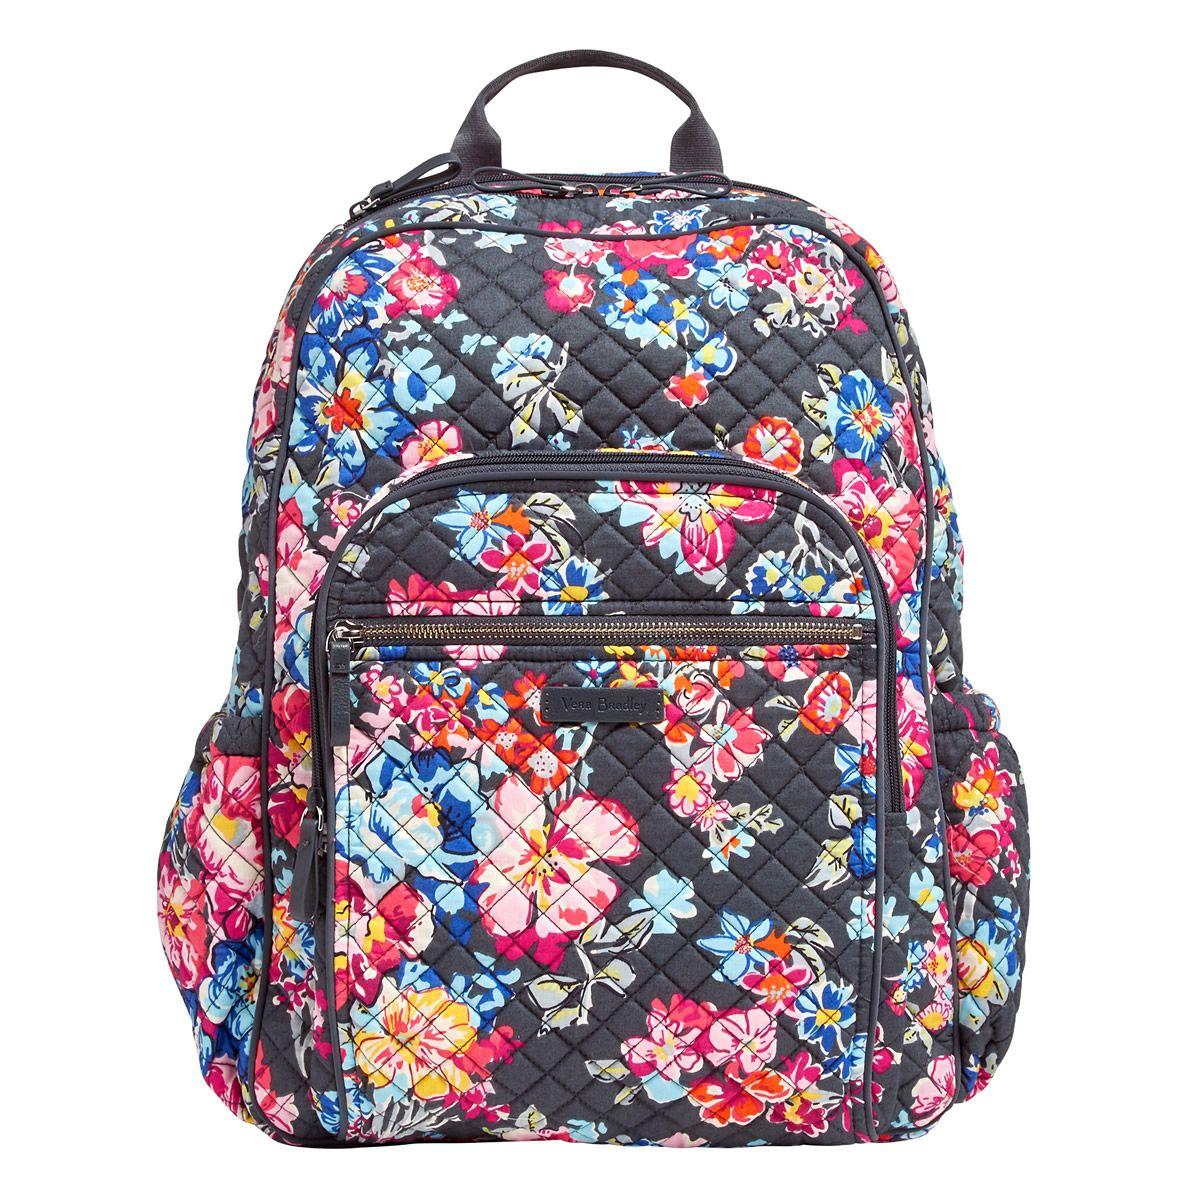 e679722de6 Vera Bradley Handbags - Macy s